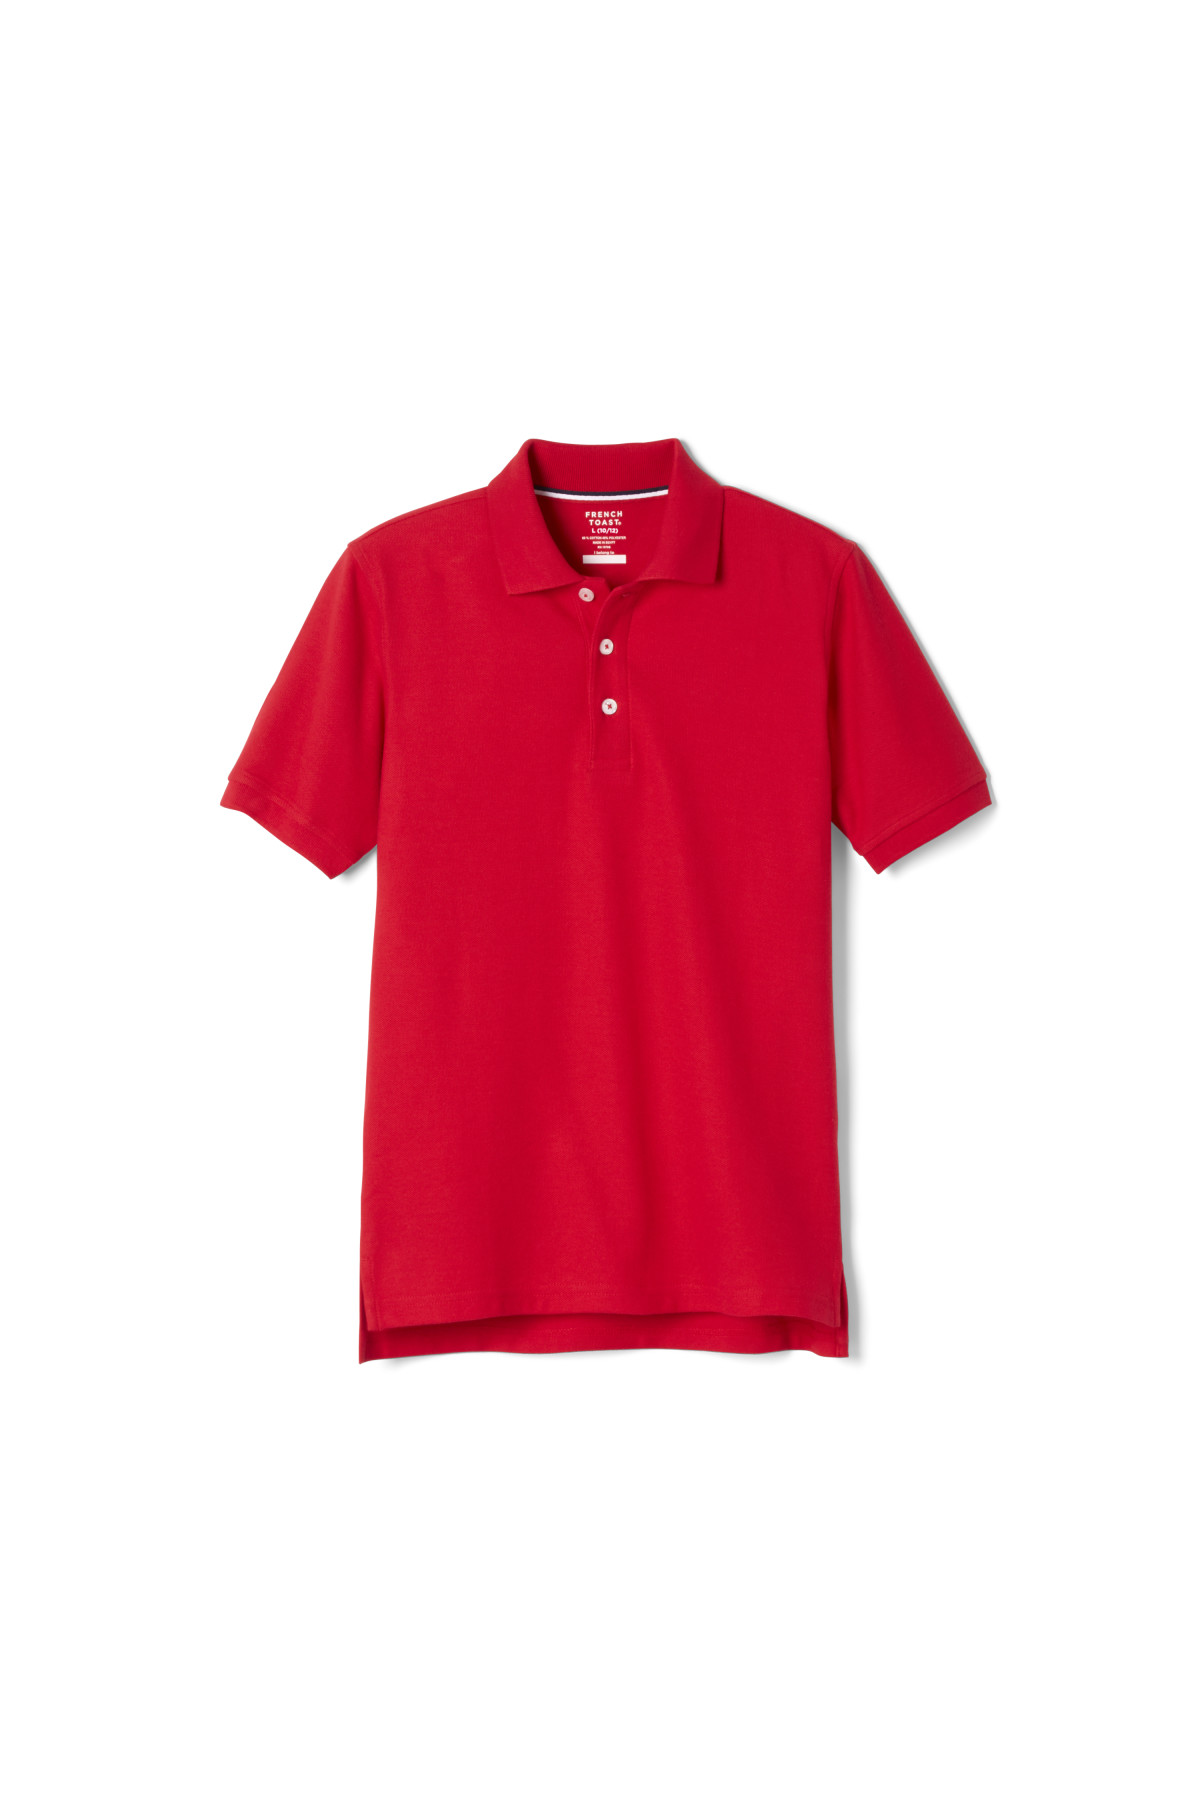 French Toast Toddler Unisex Short Sleeve Navy Pique Knit Polo Shirt